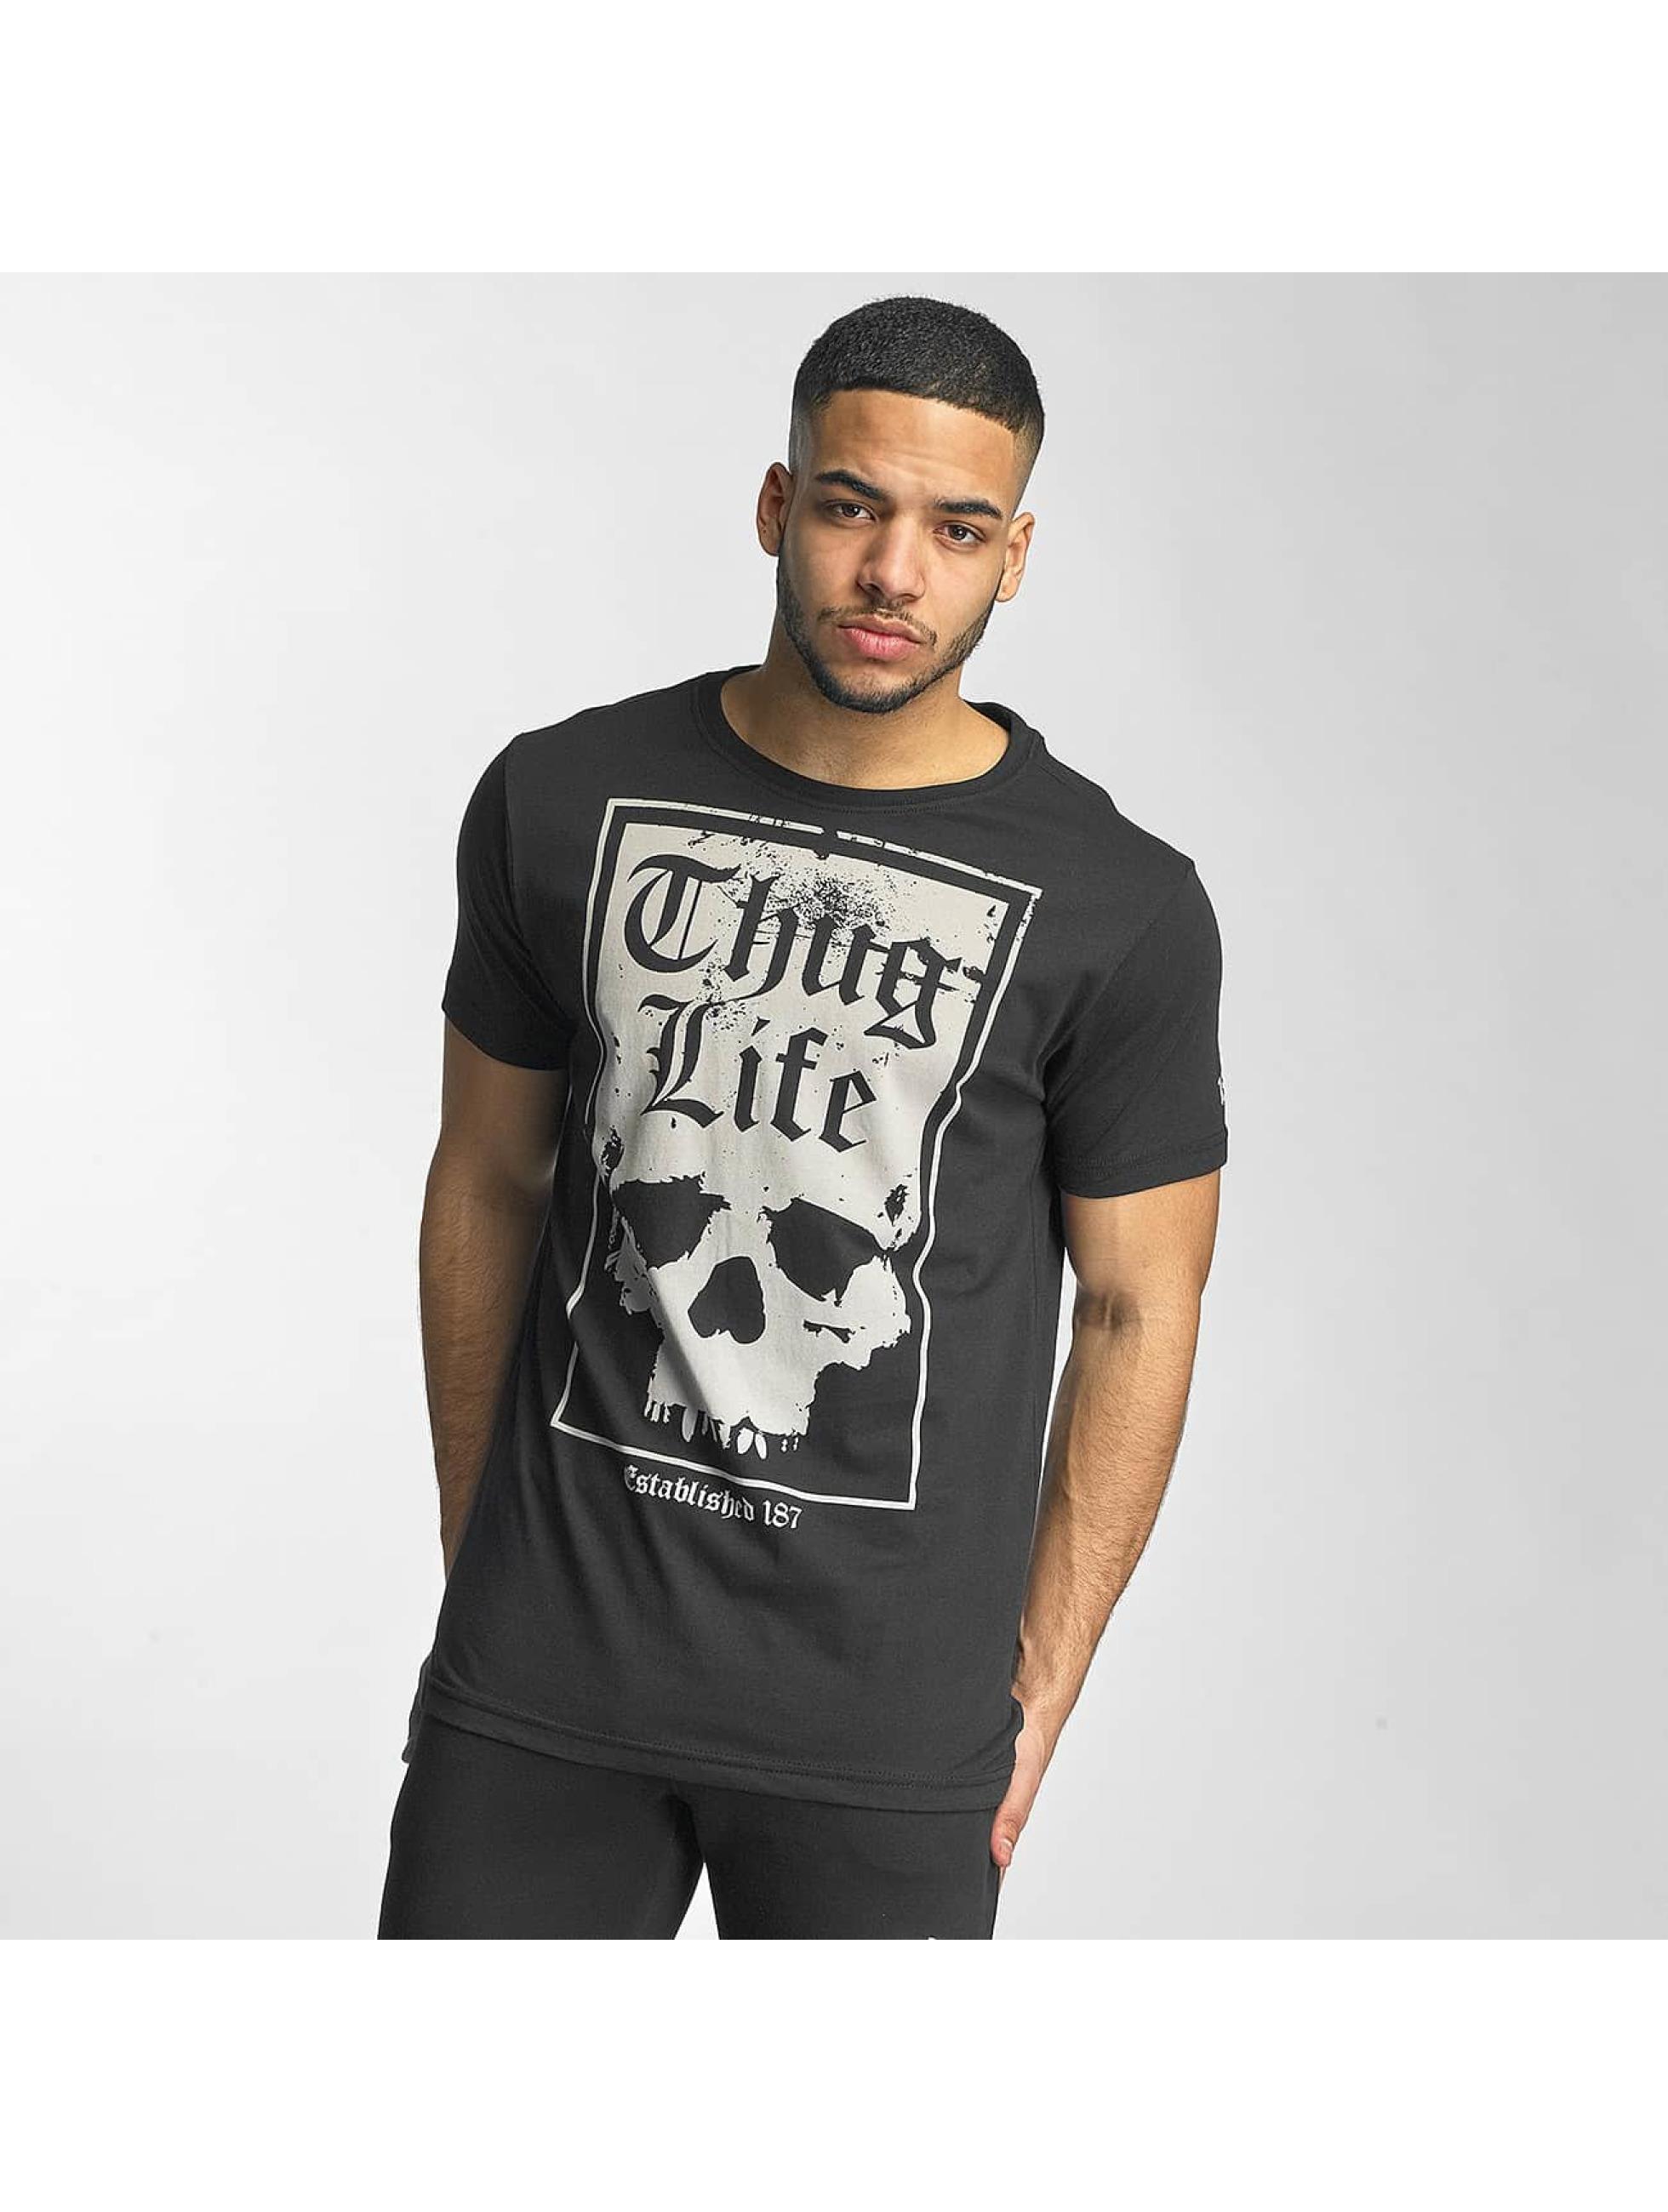 Thug Life / T-Shirt Established 187 in black L